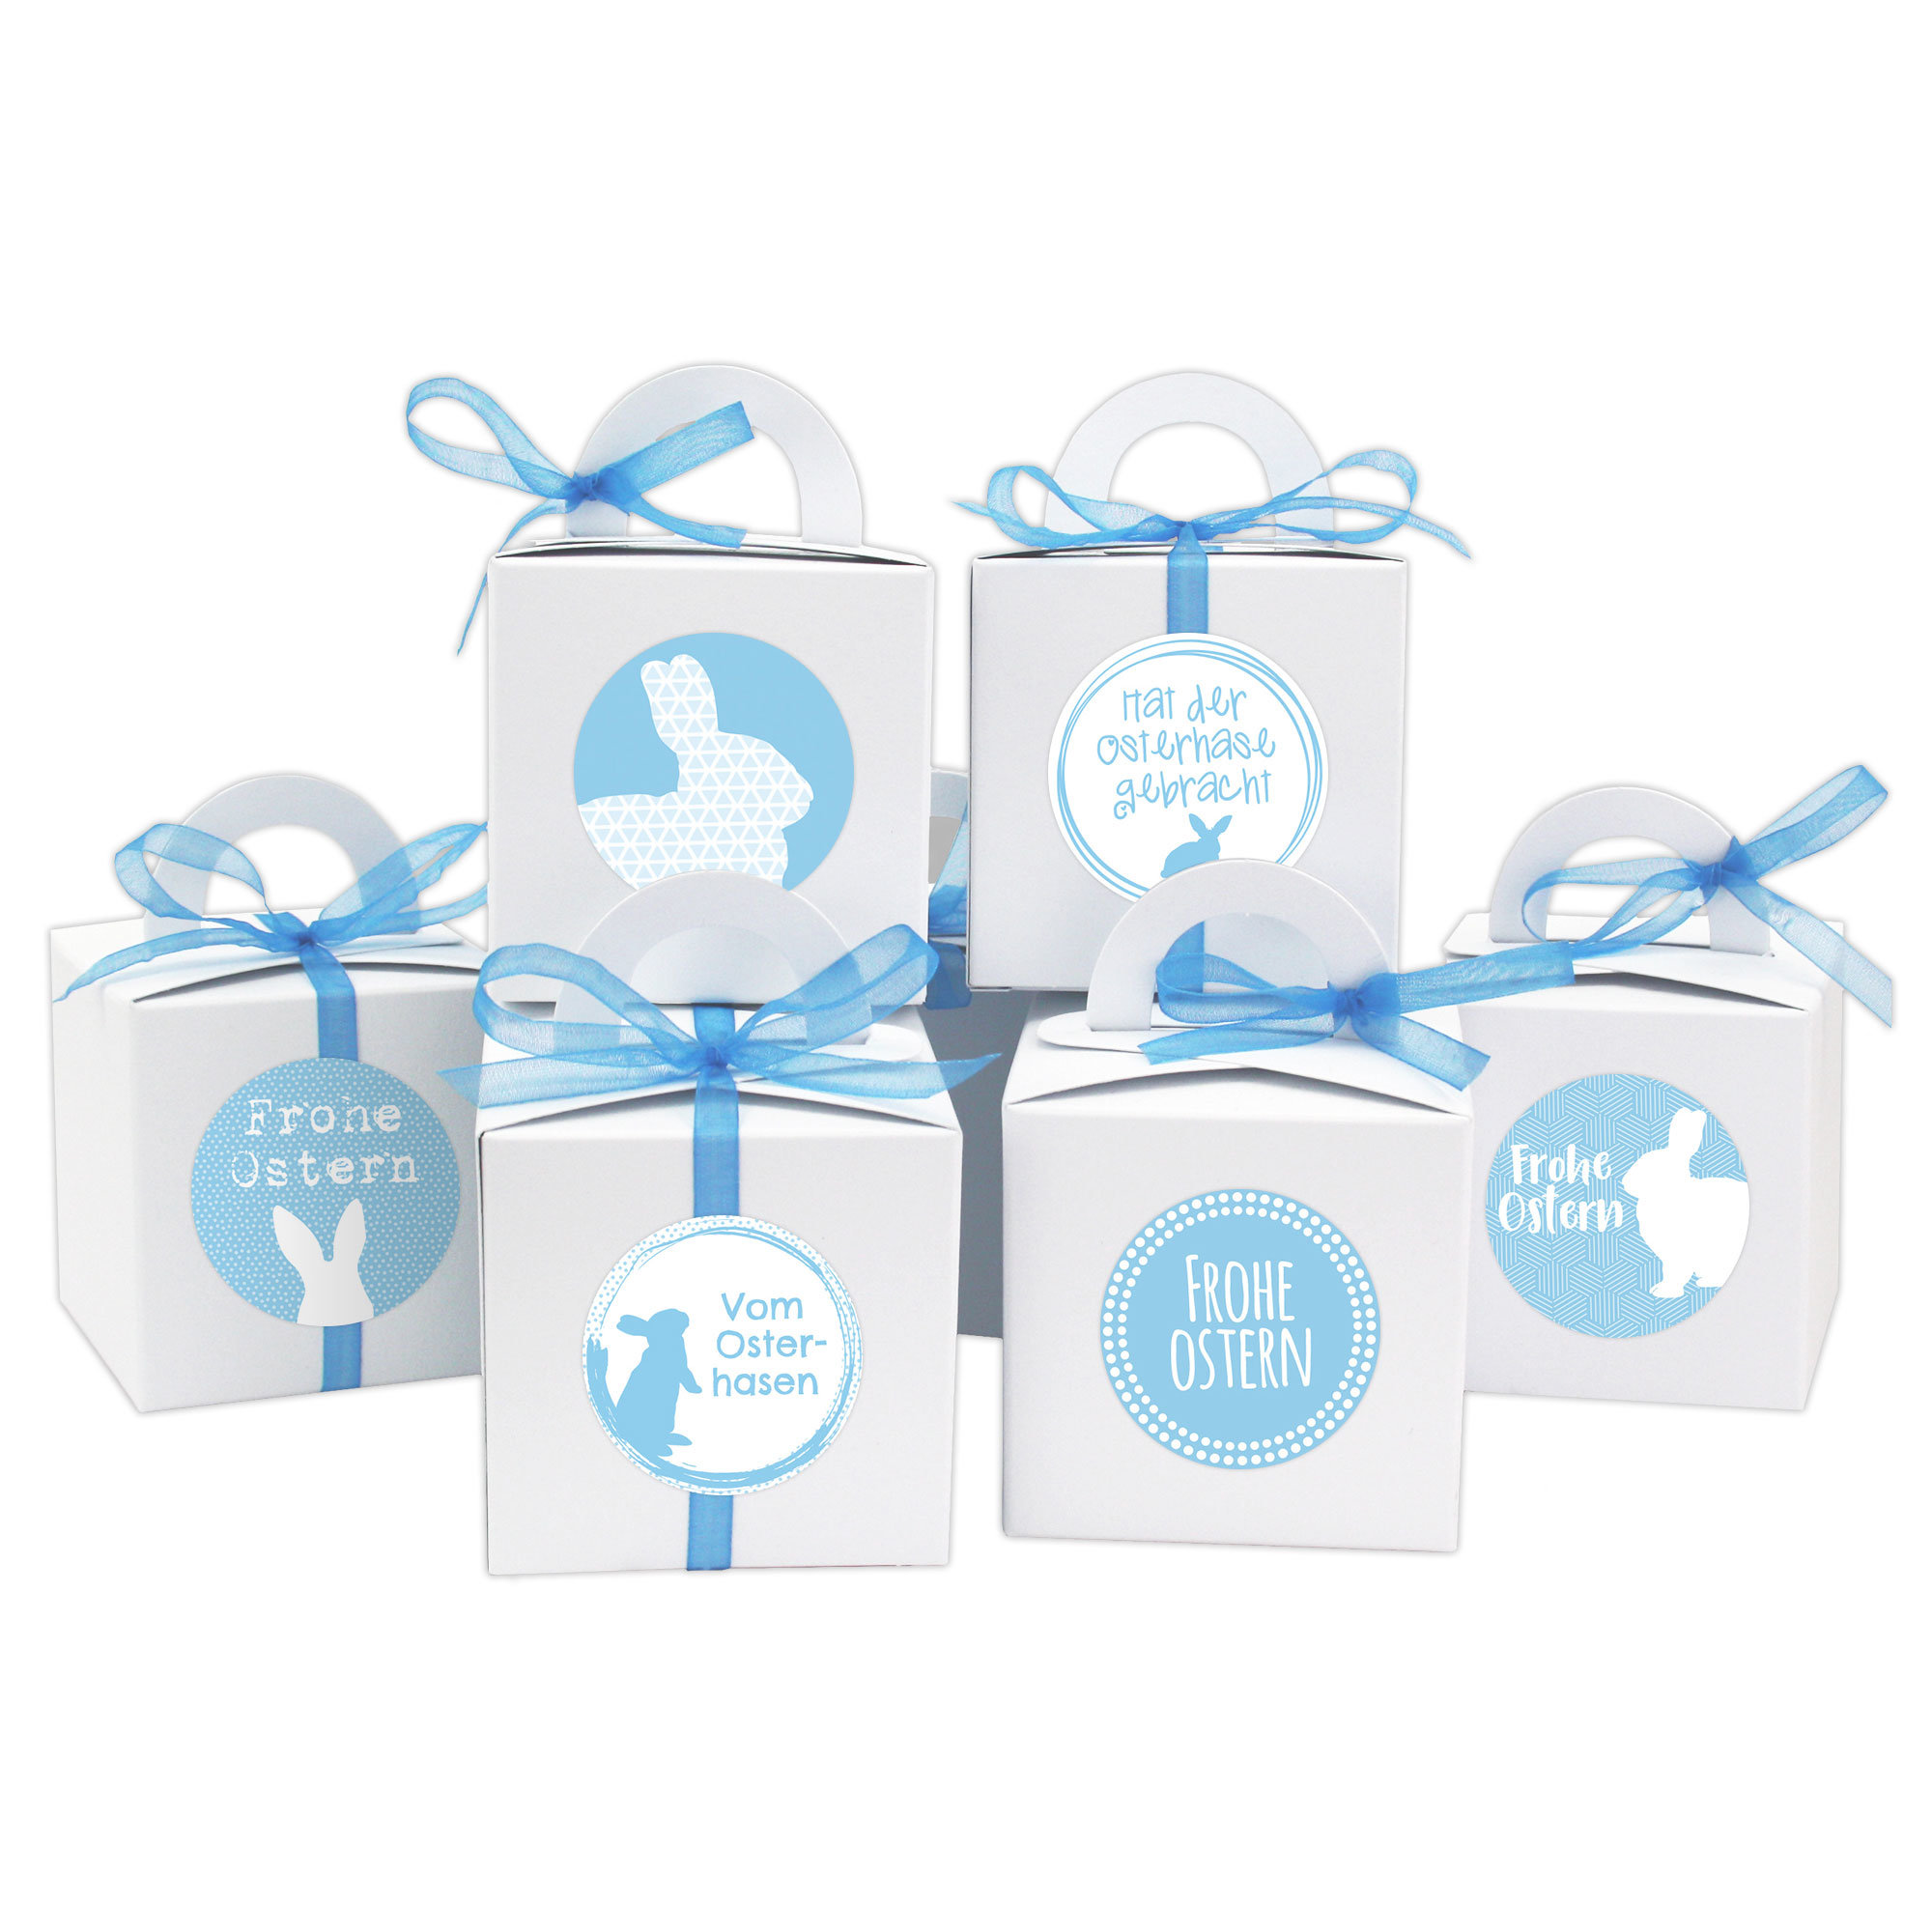 diy osterhasen kisten wei e geschenkboxen zu ostern geschenkverpackung zum bef llen f r. Black Bedroom Furniture Sets. Home Design Ideas